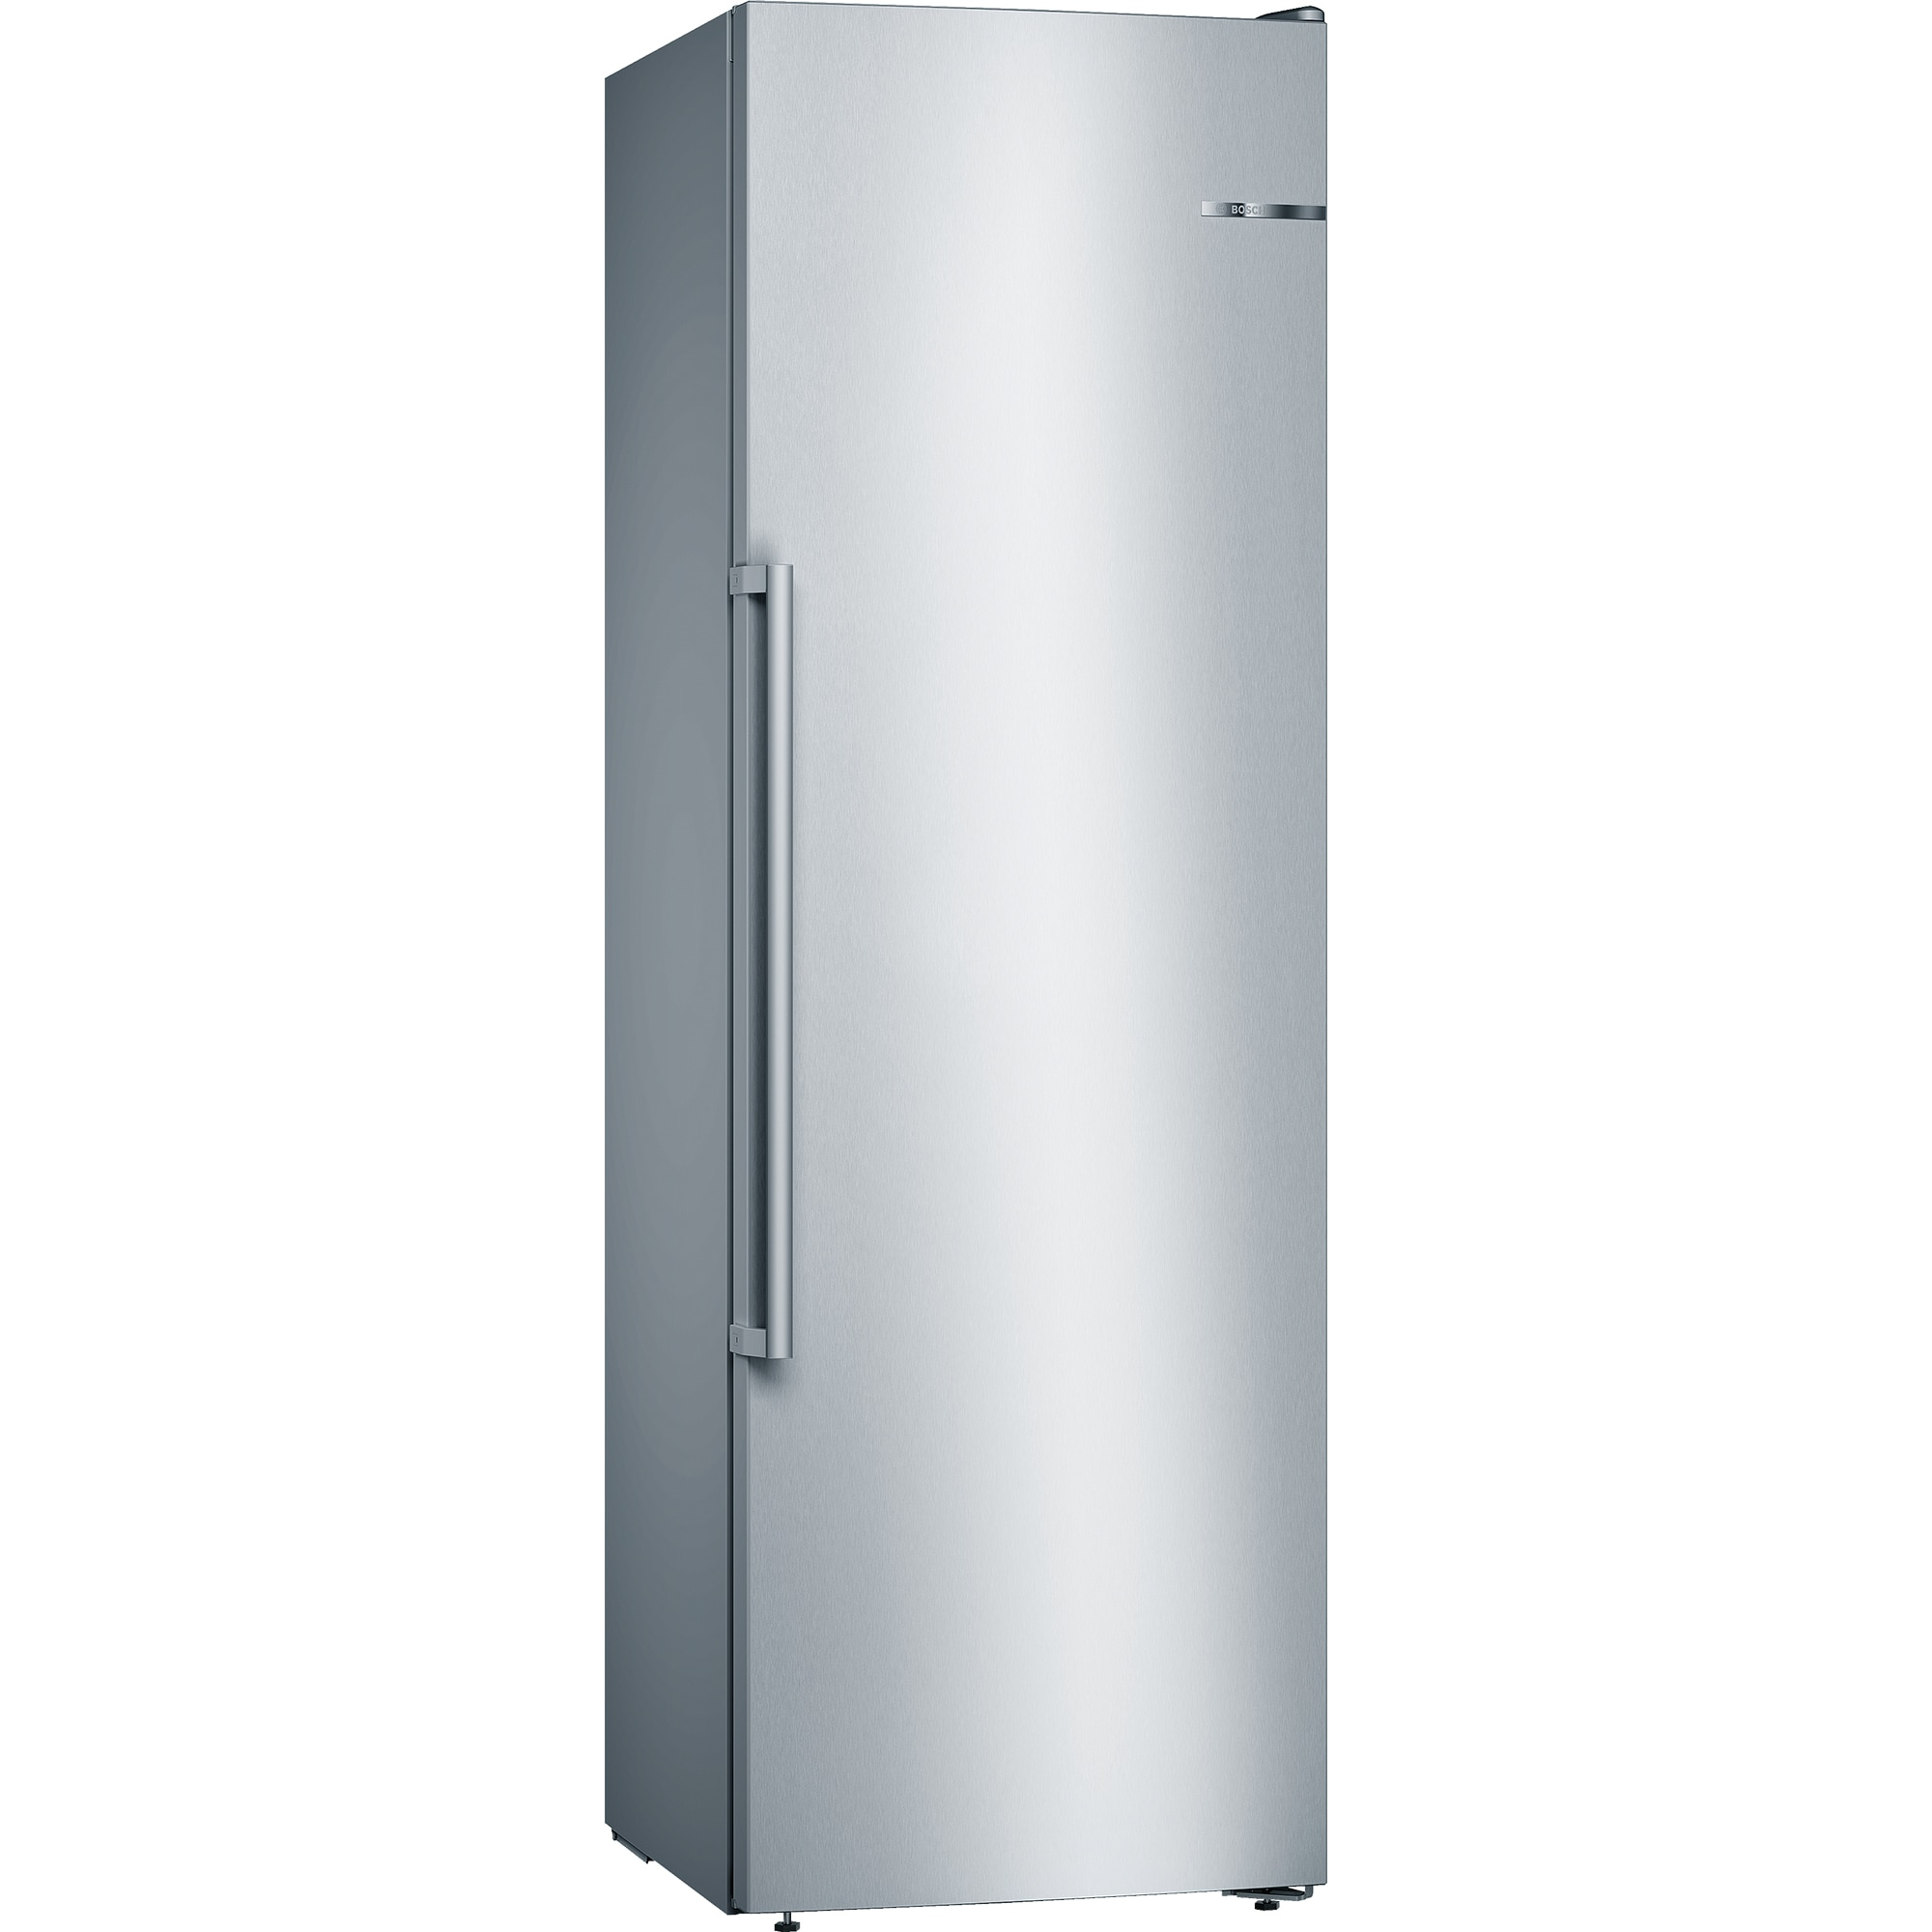 Fotografie Congelator Bosch GSN36AI3P, 242 l, 4 sertare, Clasa A++, No Frost, H 186 cm, Inox